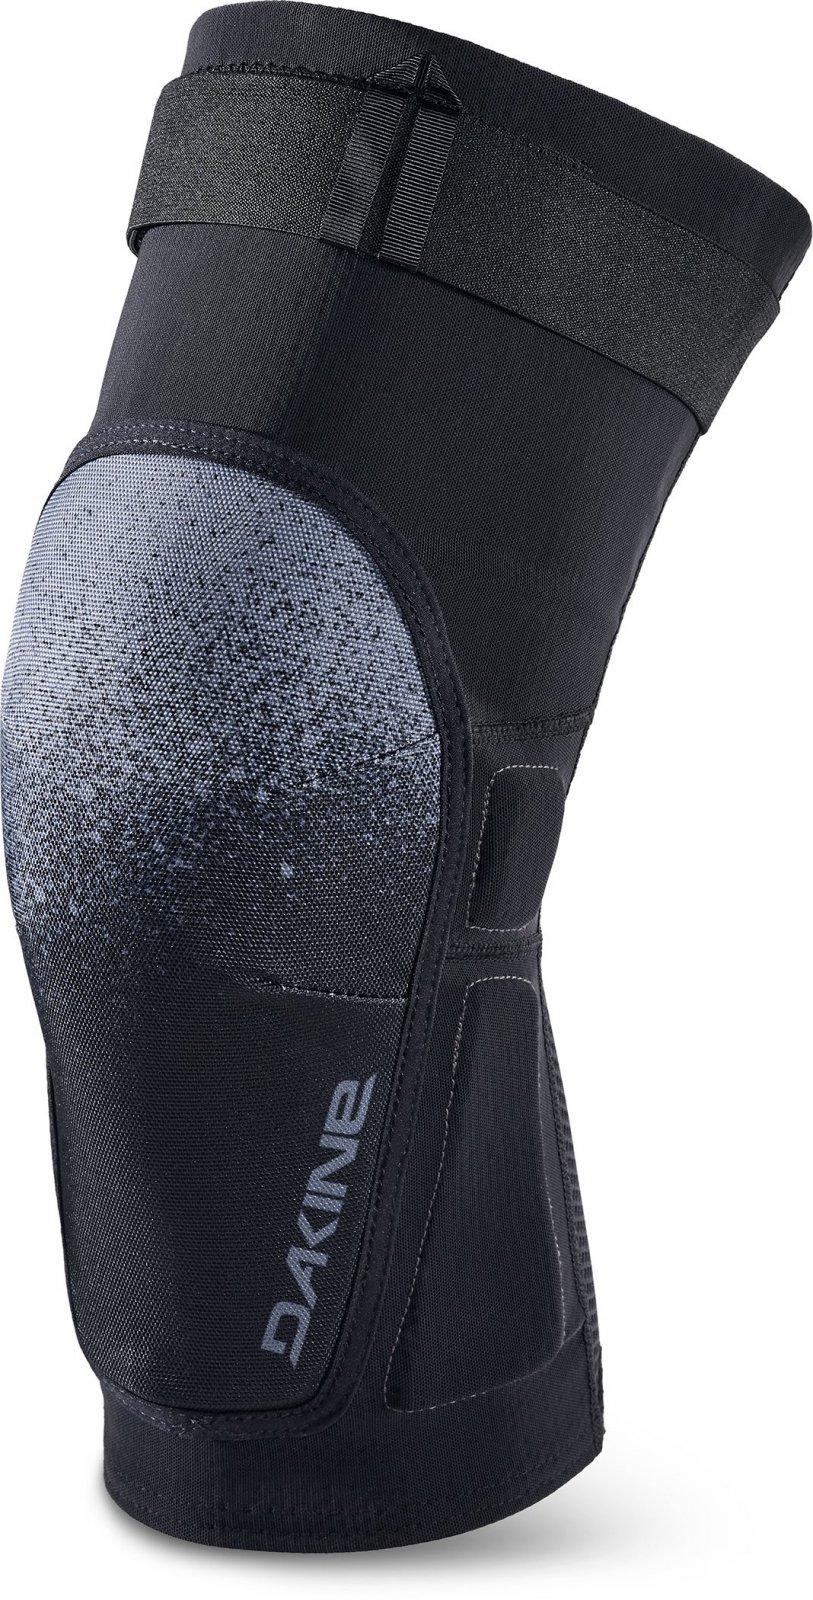 Dakine Slayer Pro Knee Pad (Multiple Size Options)